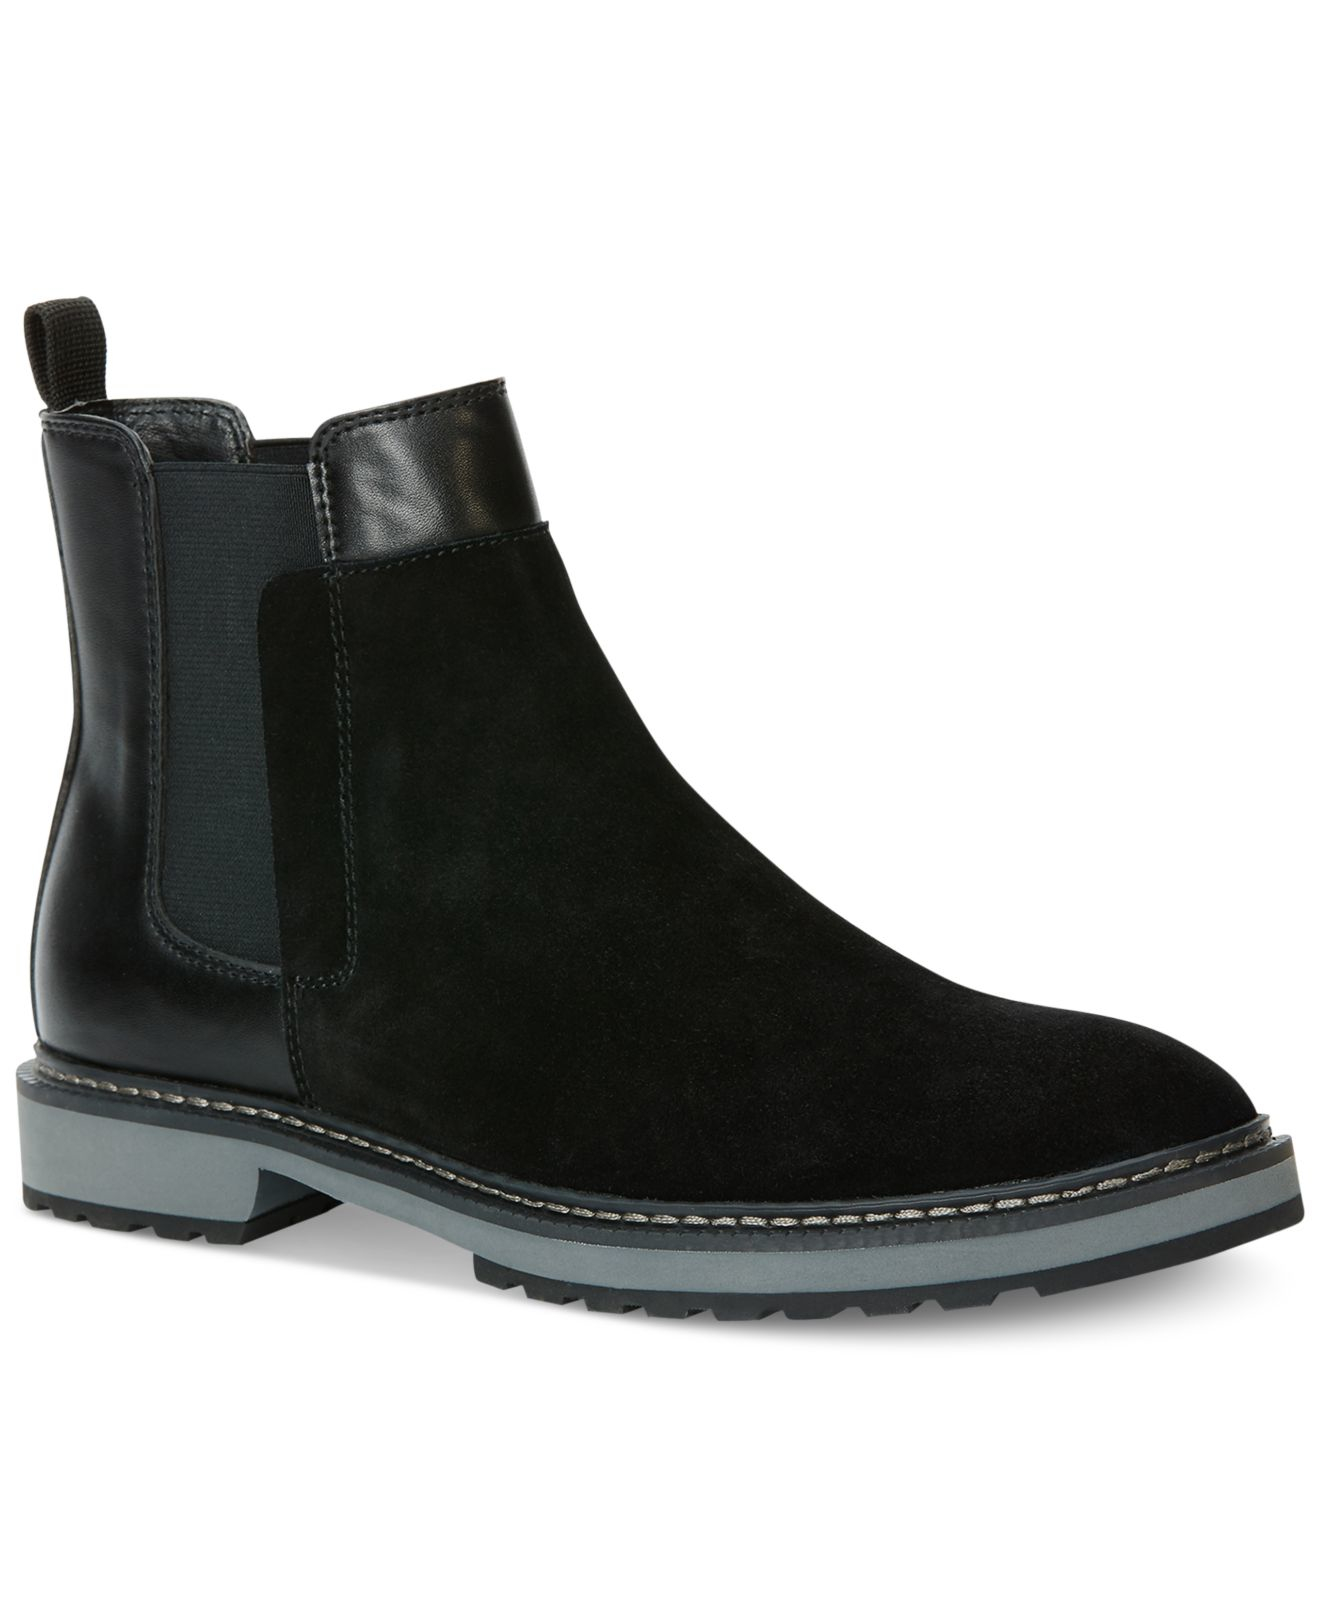 Calvin klein Avis Boots in Black for Men   Lyst